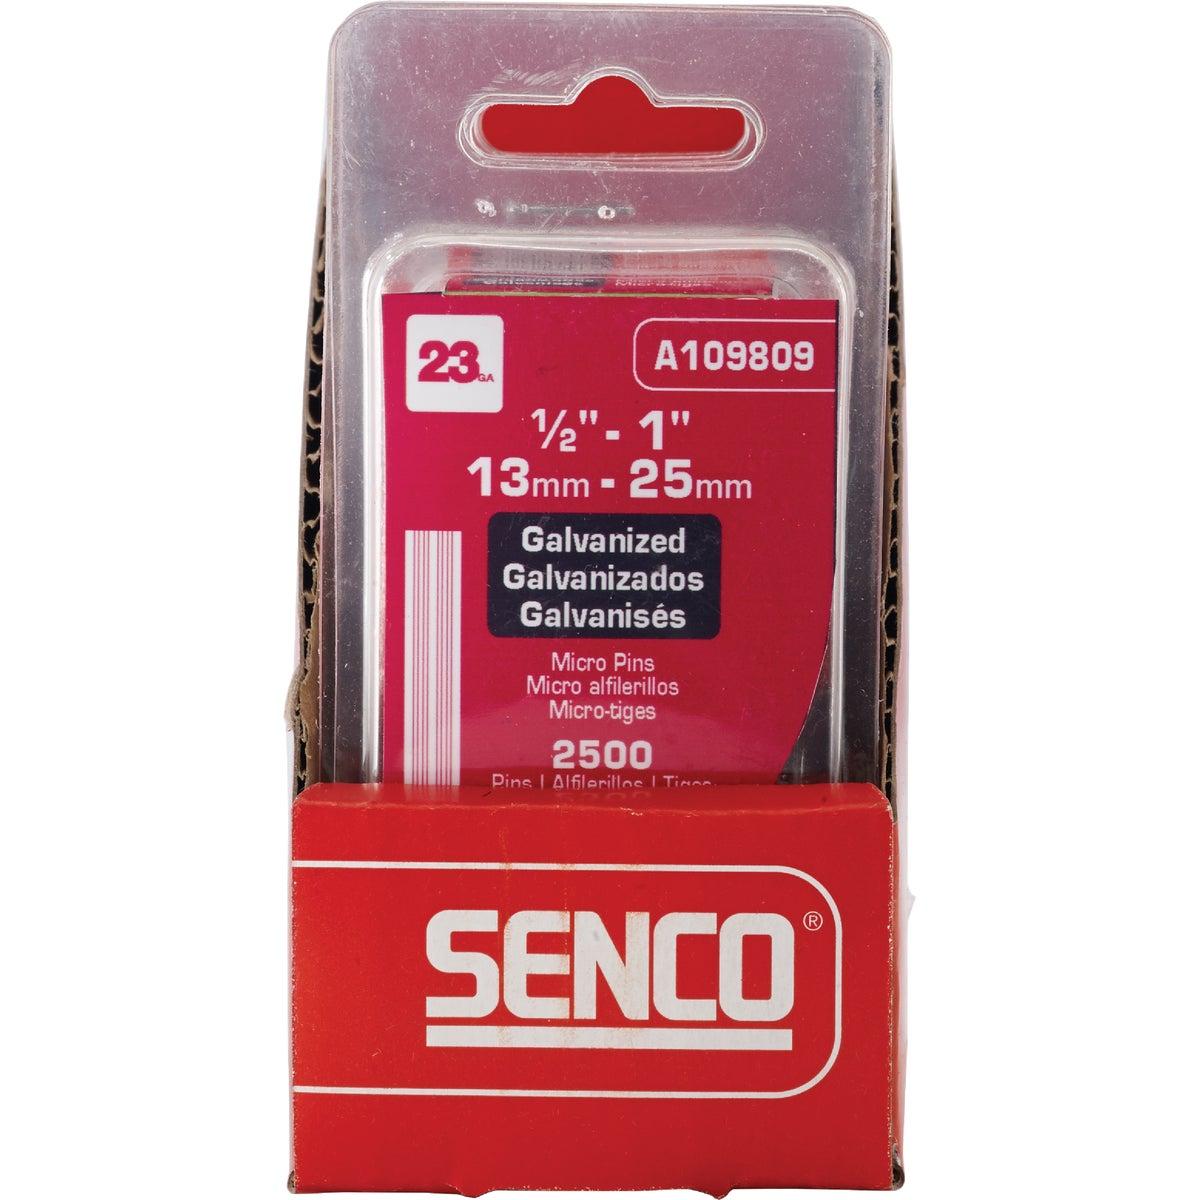 Senco MULTIPACK MICROPIN NAIL A109809